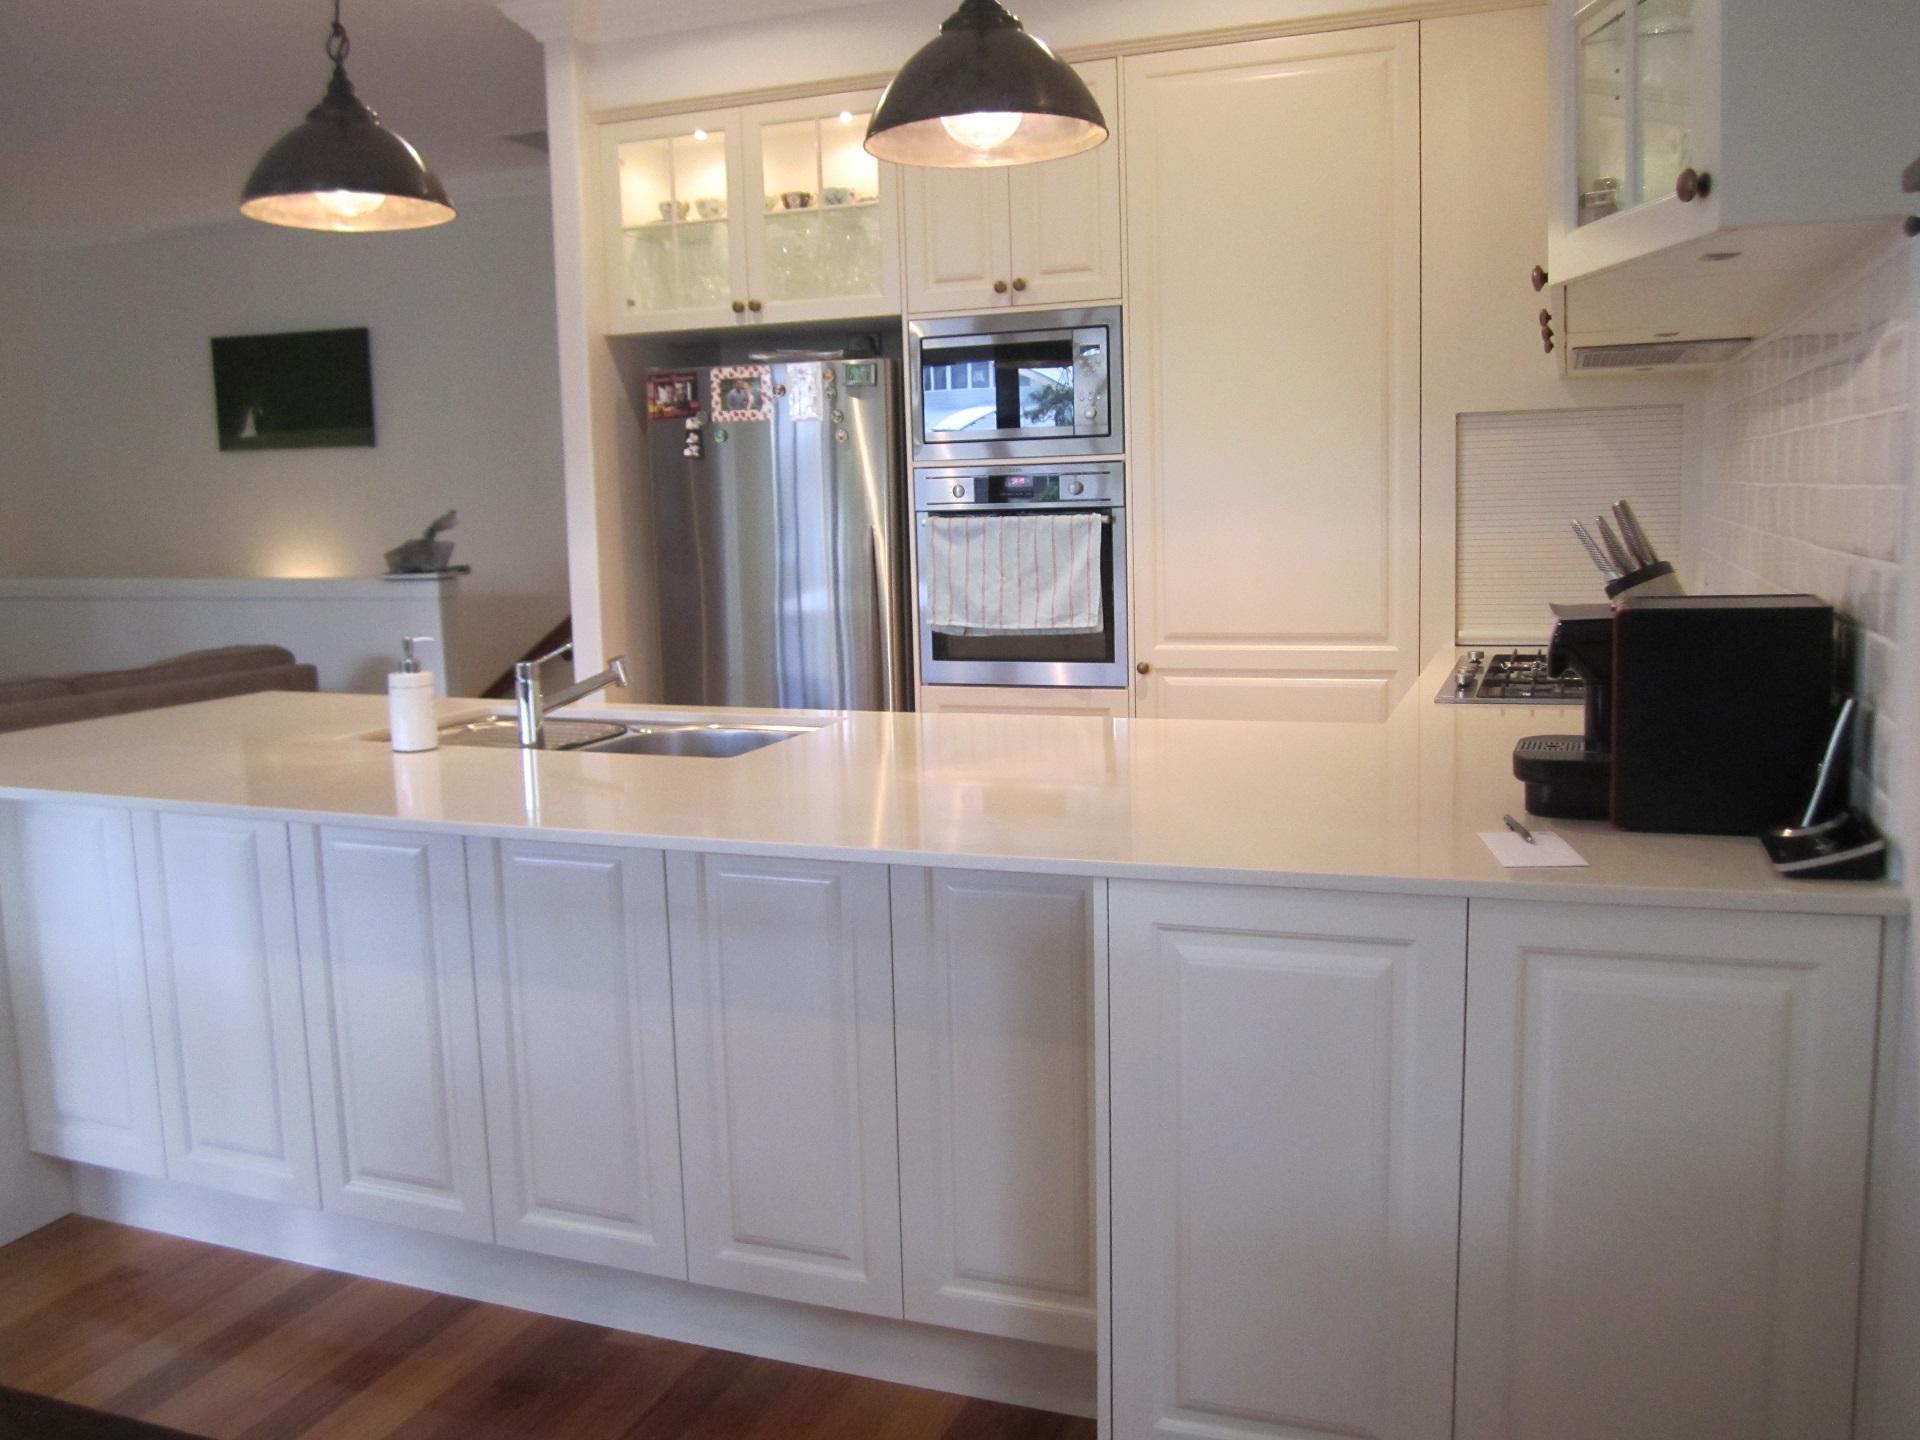 Brisbane Kitchen Design Sydney St Camp Hill  Traditional Kitchen Renovation (2)